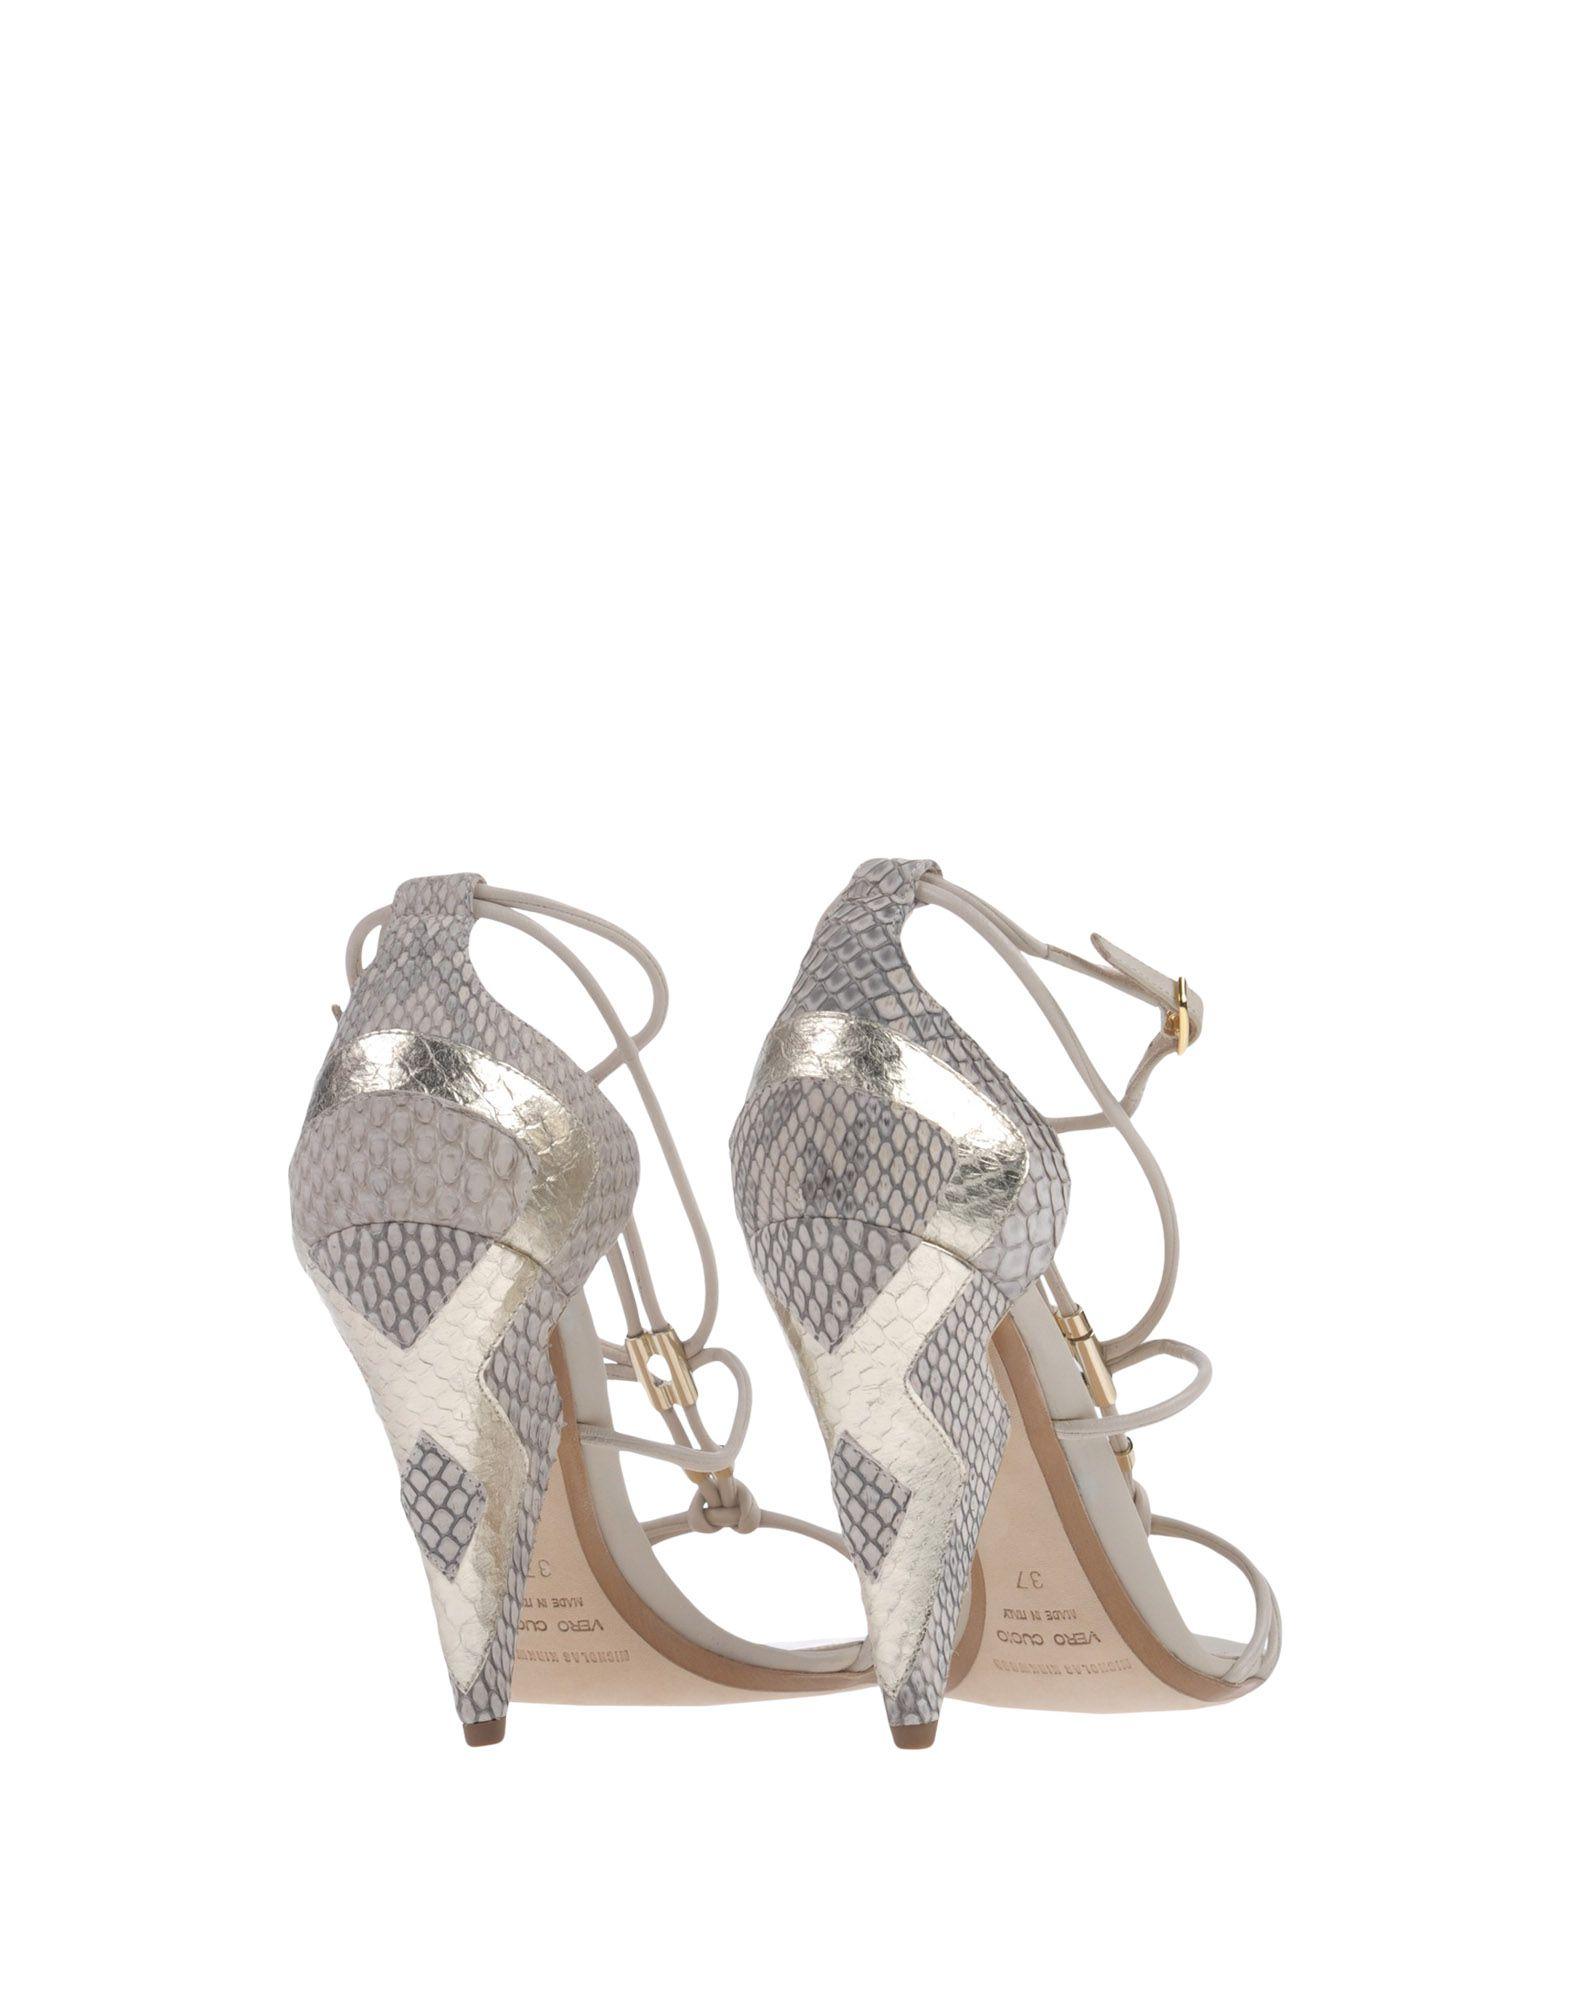 Nicholas Kirkwood Kirkwood Kirkwood Sandalen Damen  11366555MR Beliebte Schuhe f026e9